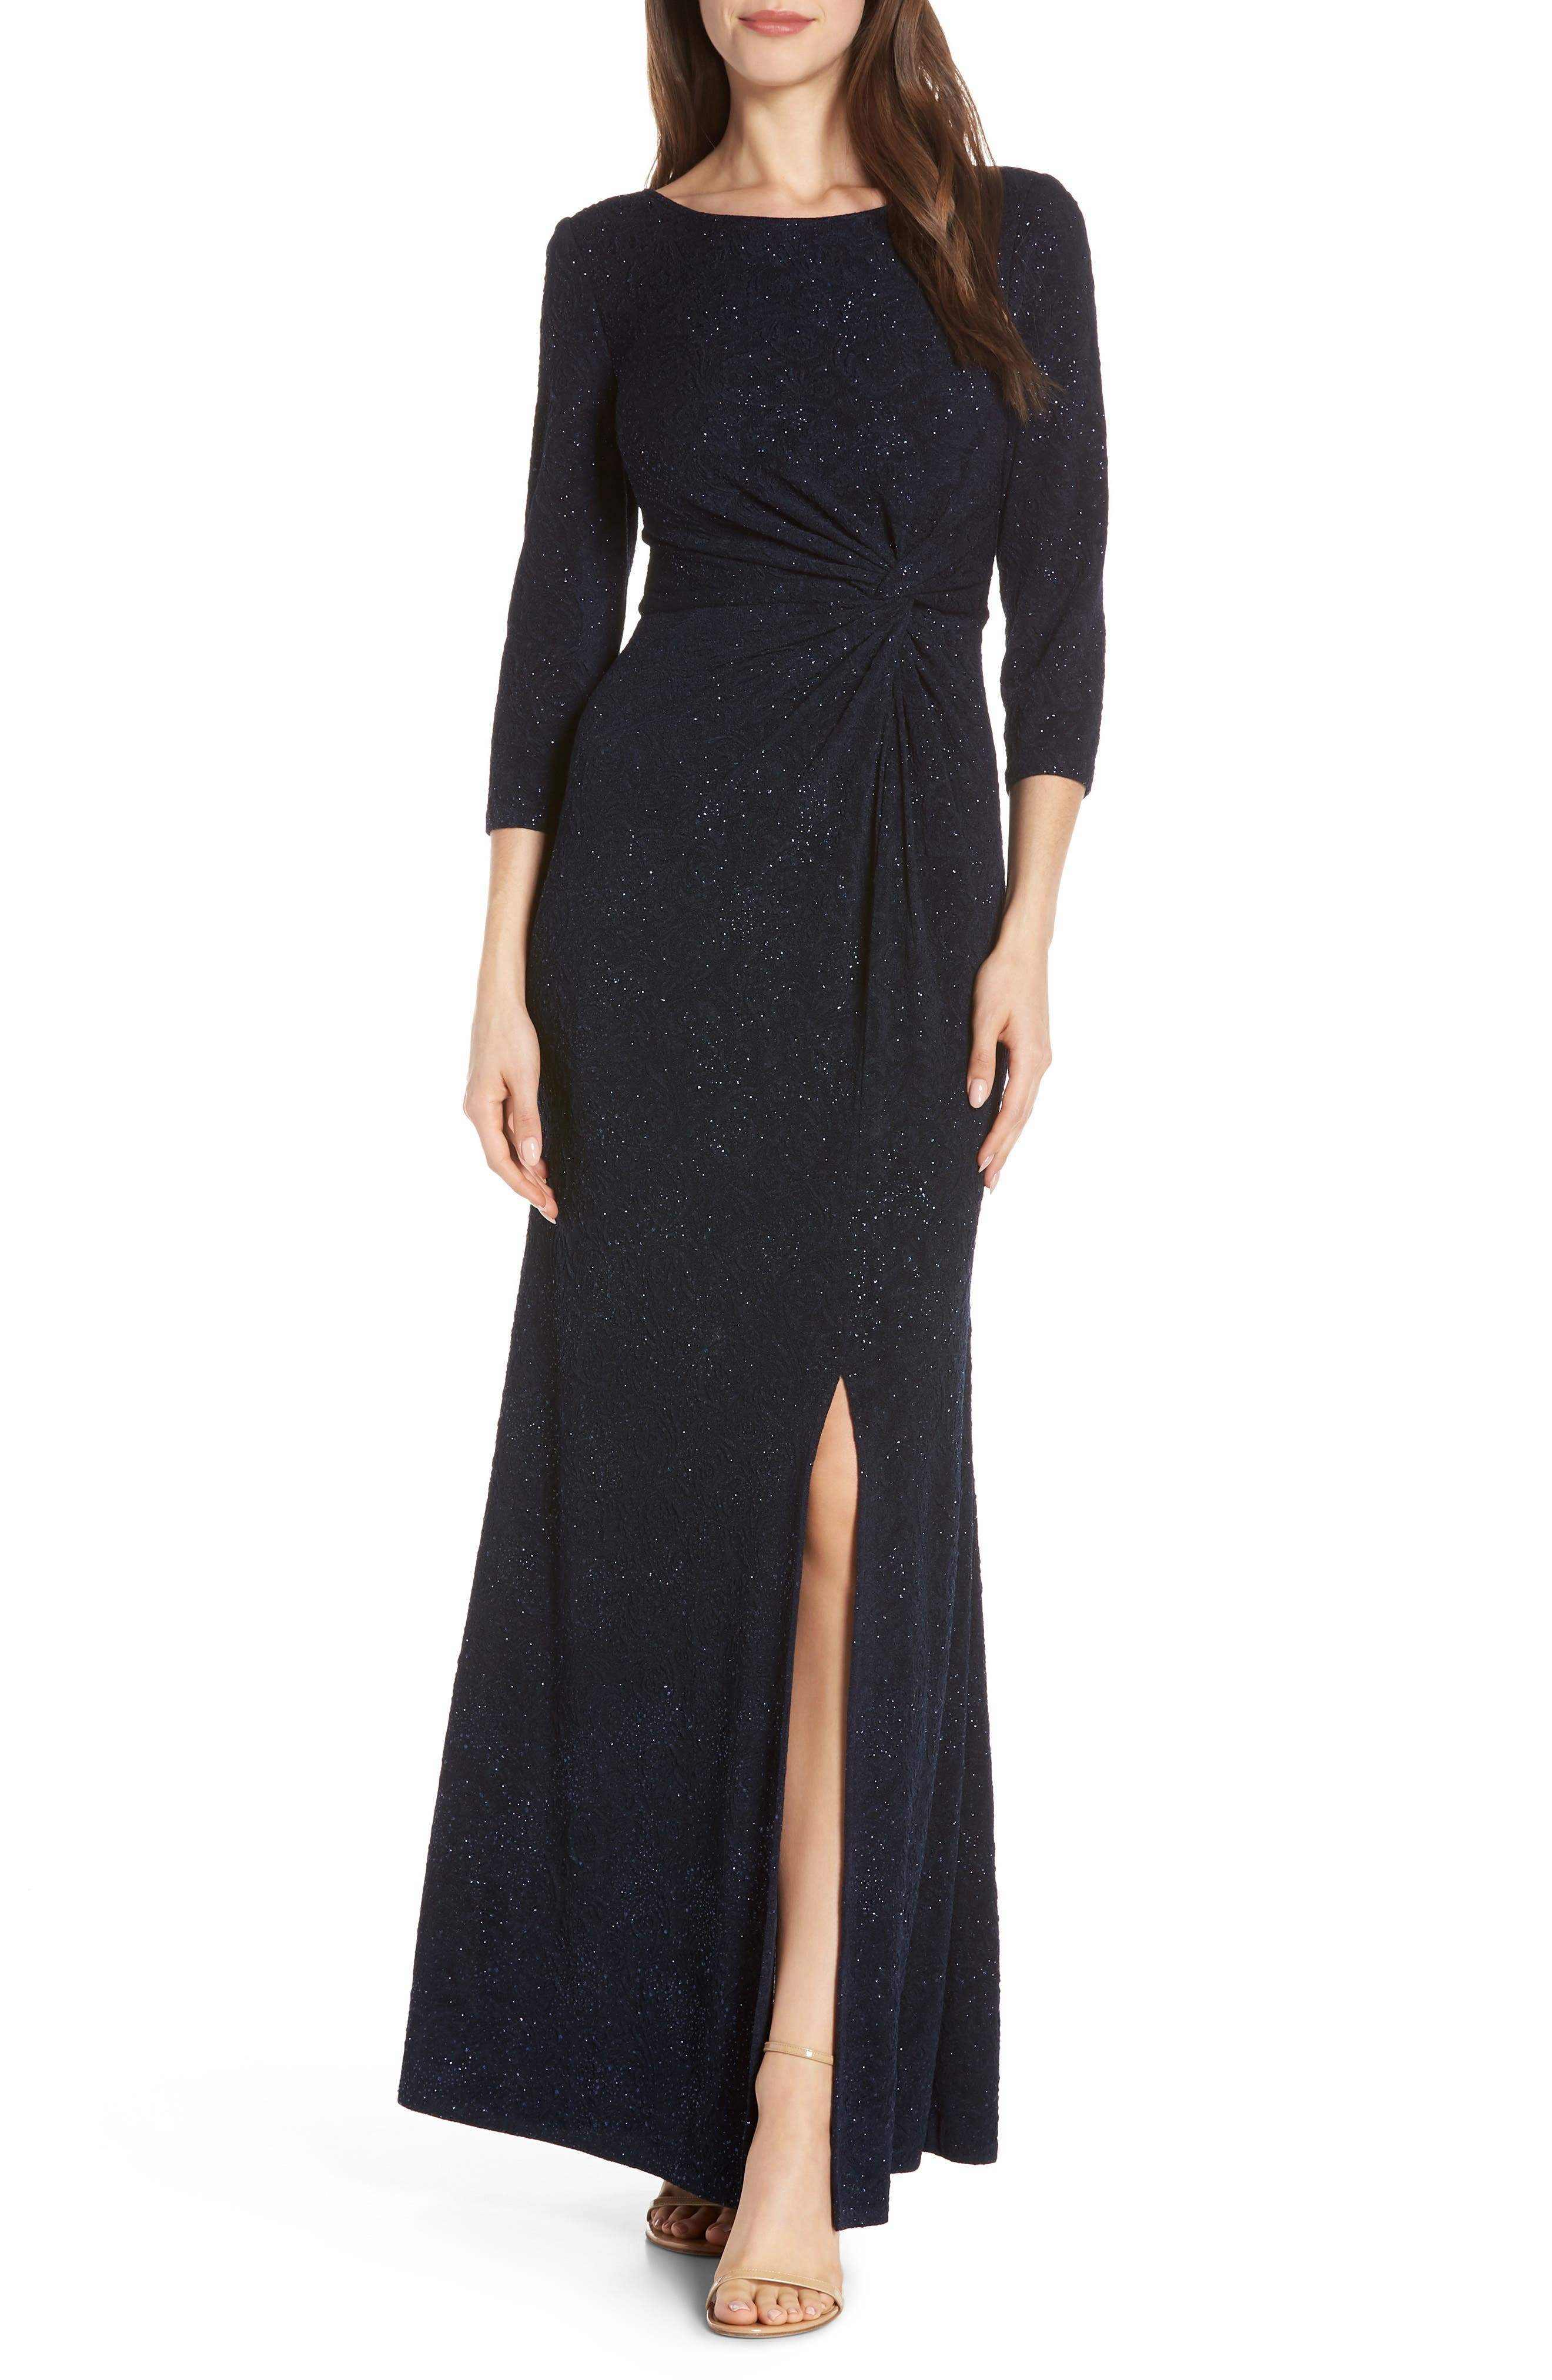 ALEX EVENINGS, Knot Front Sequin Jacquard Evening Dress, Main thumbnail 1, color, NAVY